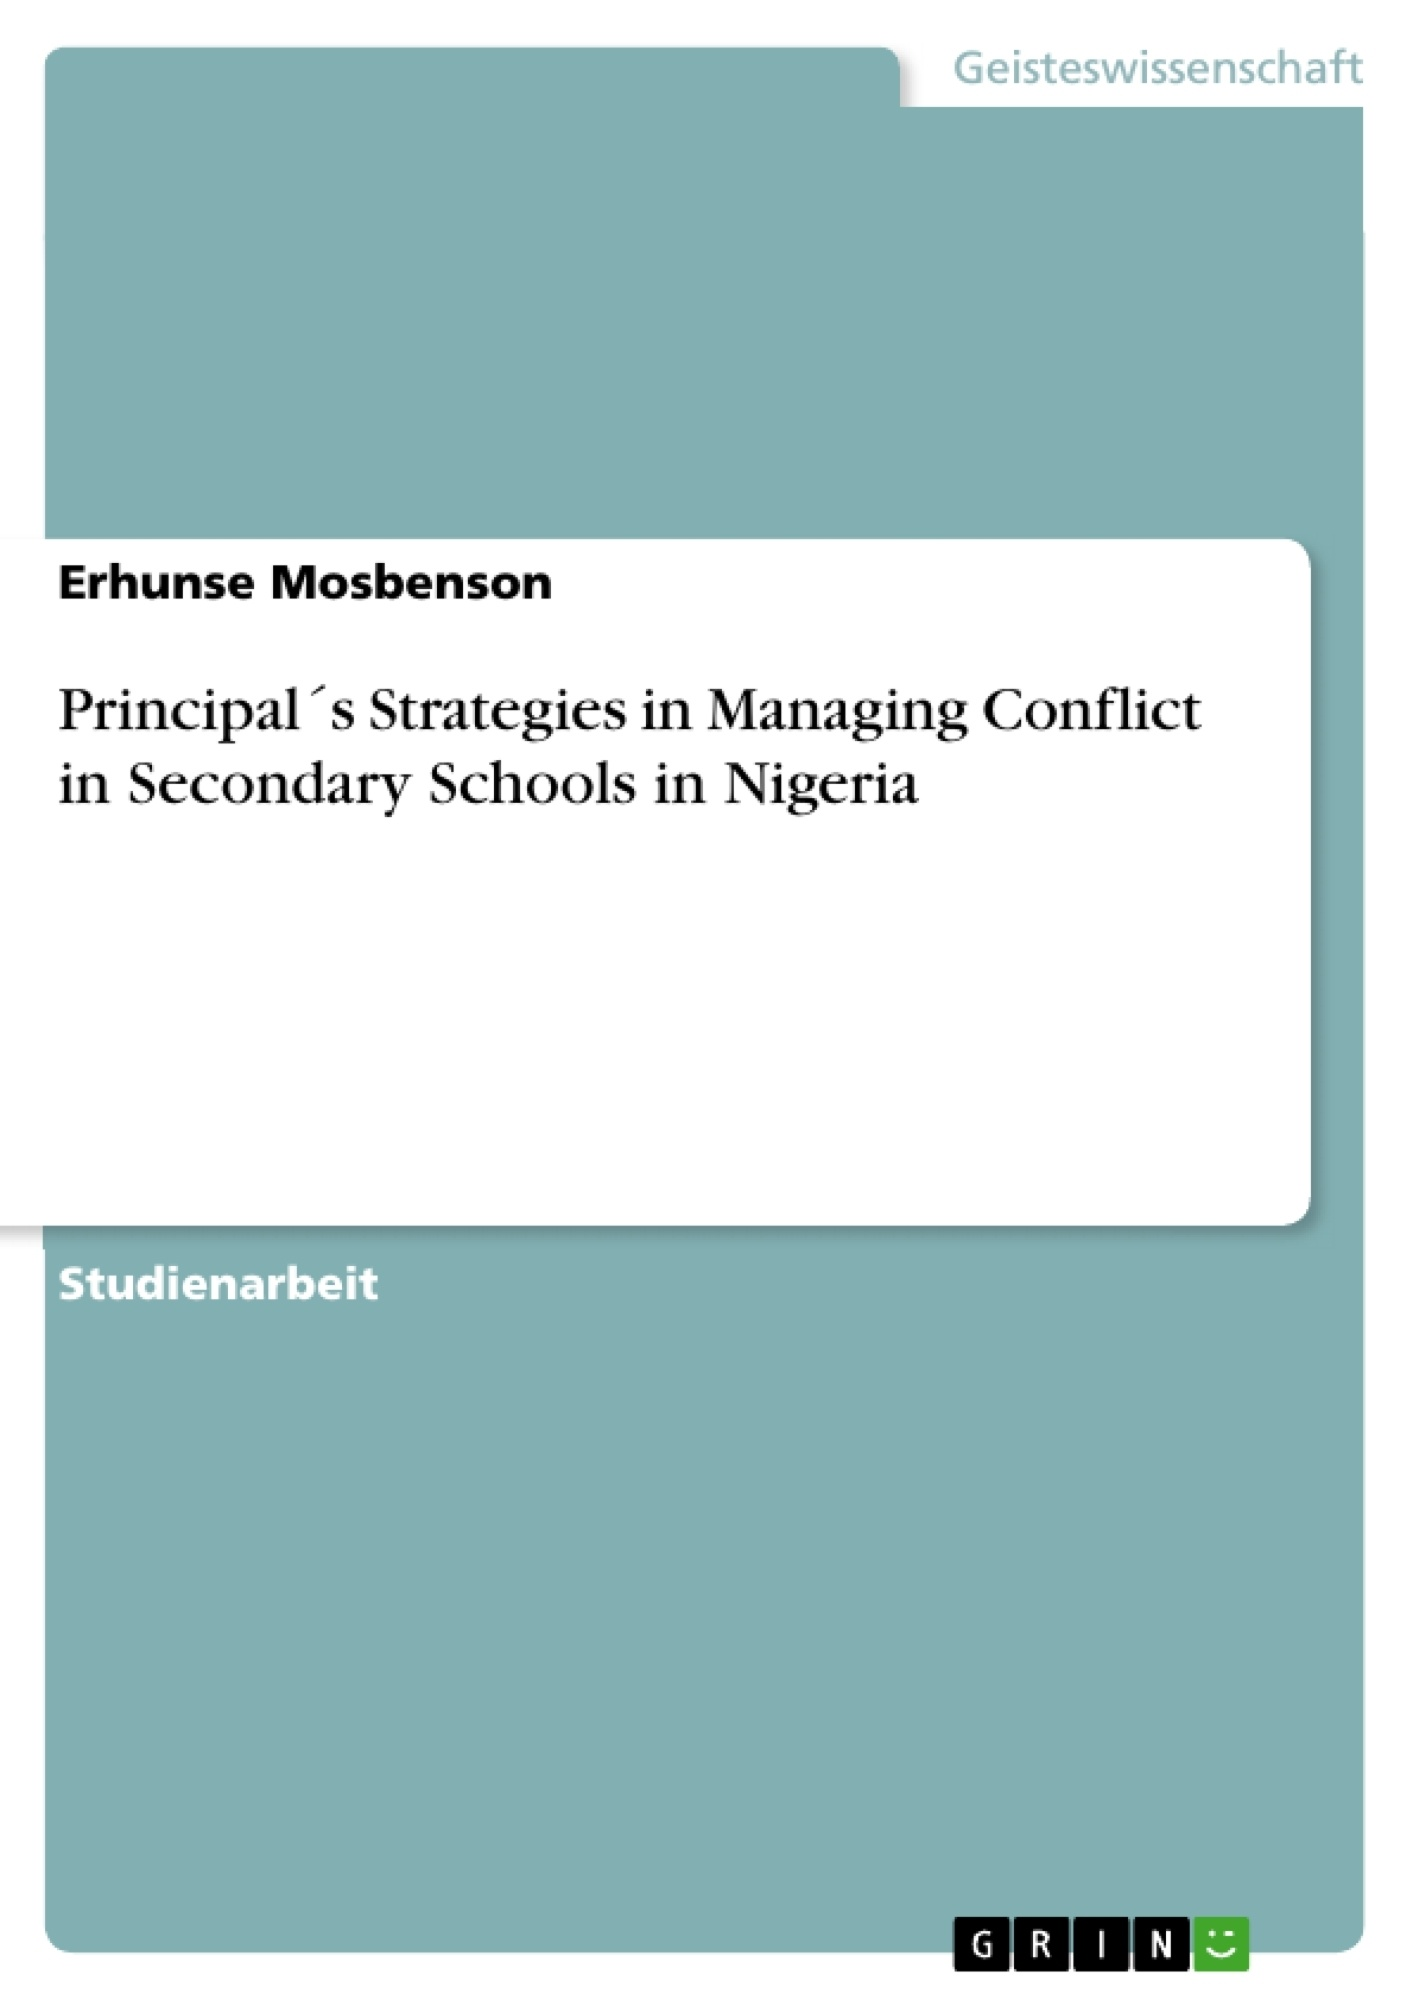 Titel: Principal´s Strategies in Managing Conflict in Secondary Schools in Nigeria